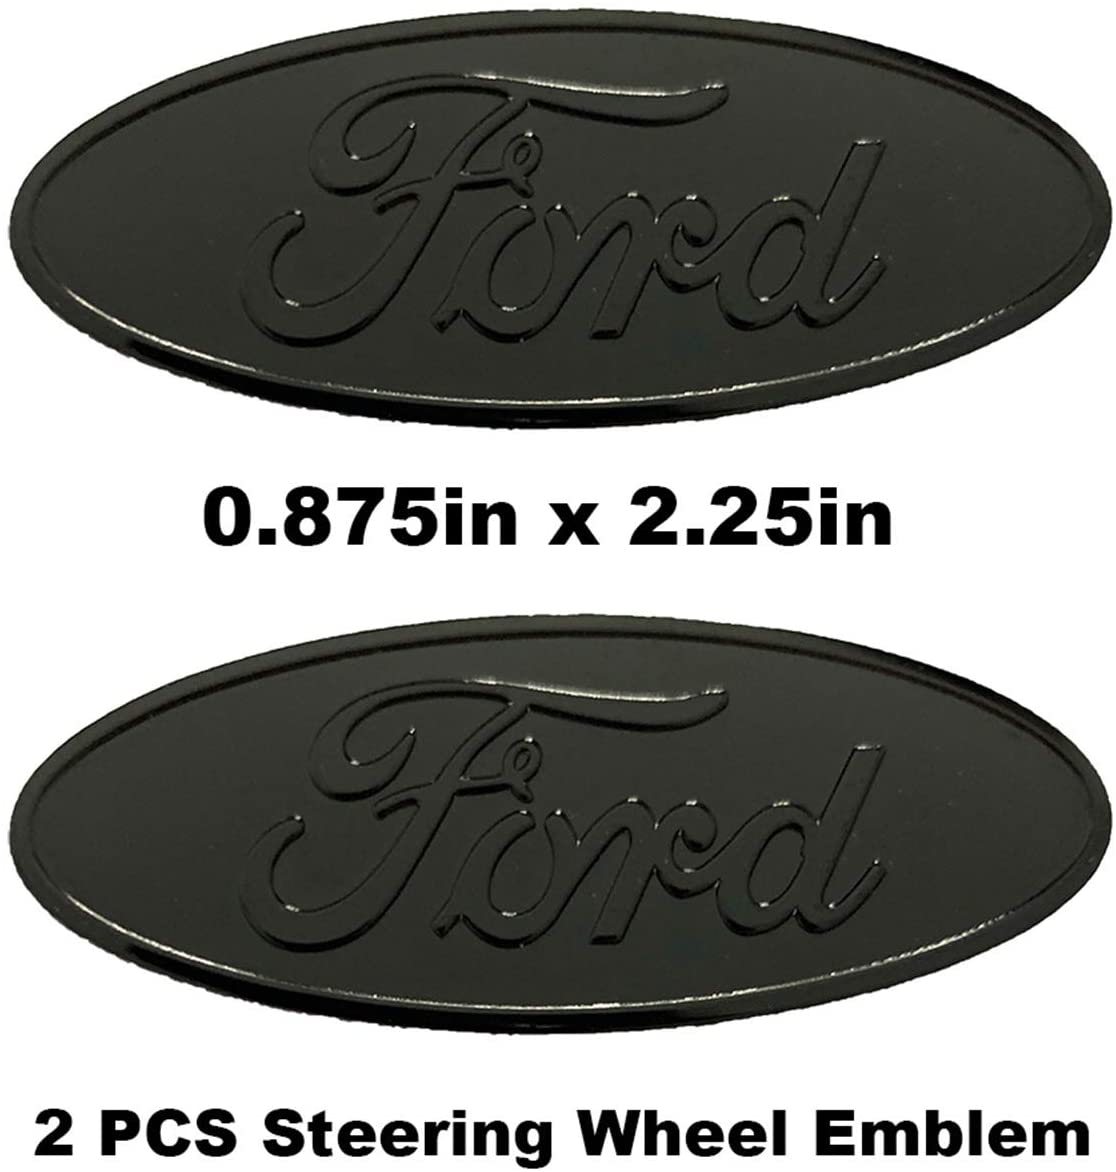 2 PCS 스티어링 휠 로고 알루미늄 엠블럼 배지 오버레이 데칼 스티커 F150 레인저 익스플로러 가장자리 탐험 (2 1   4